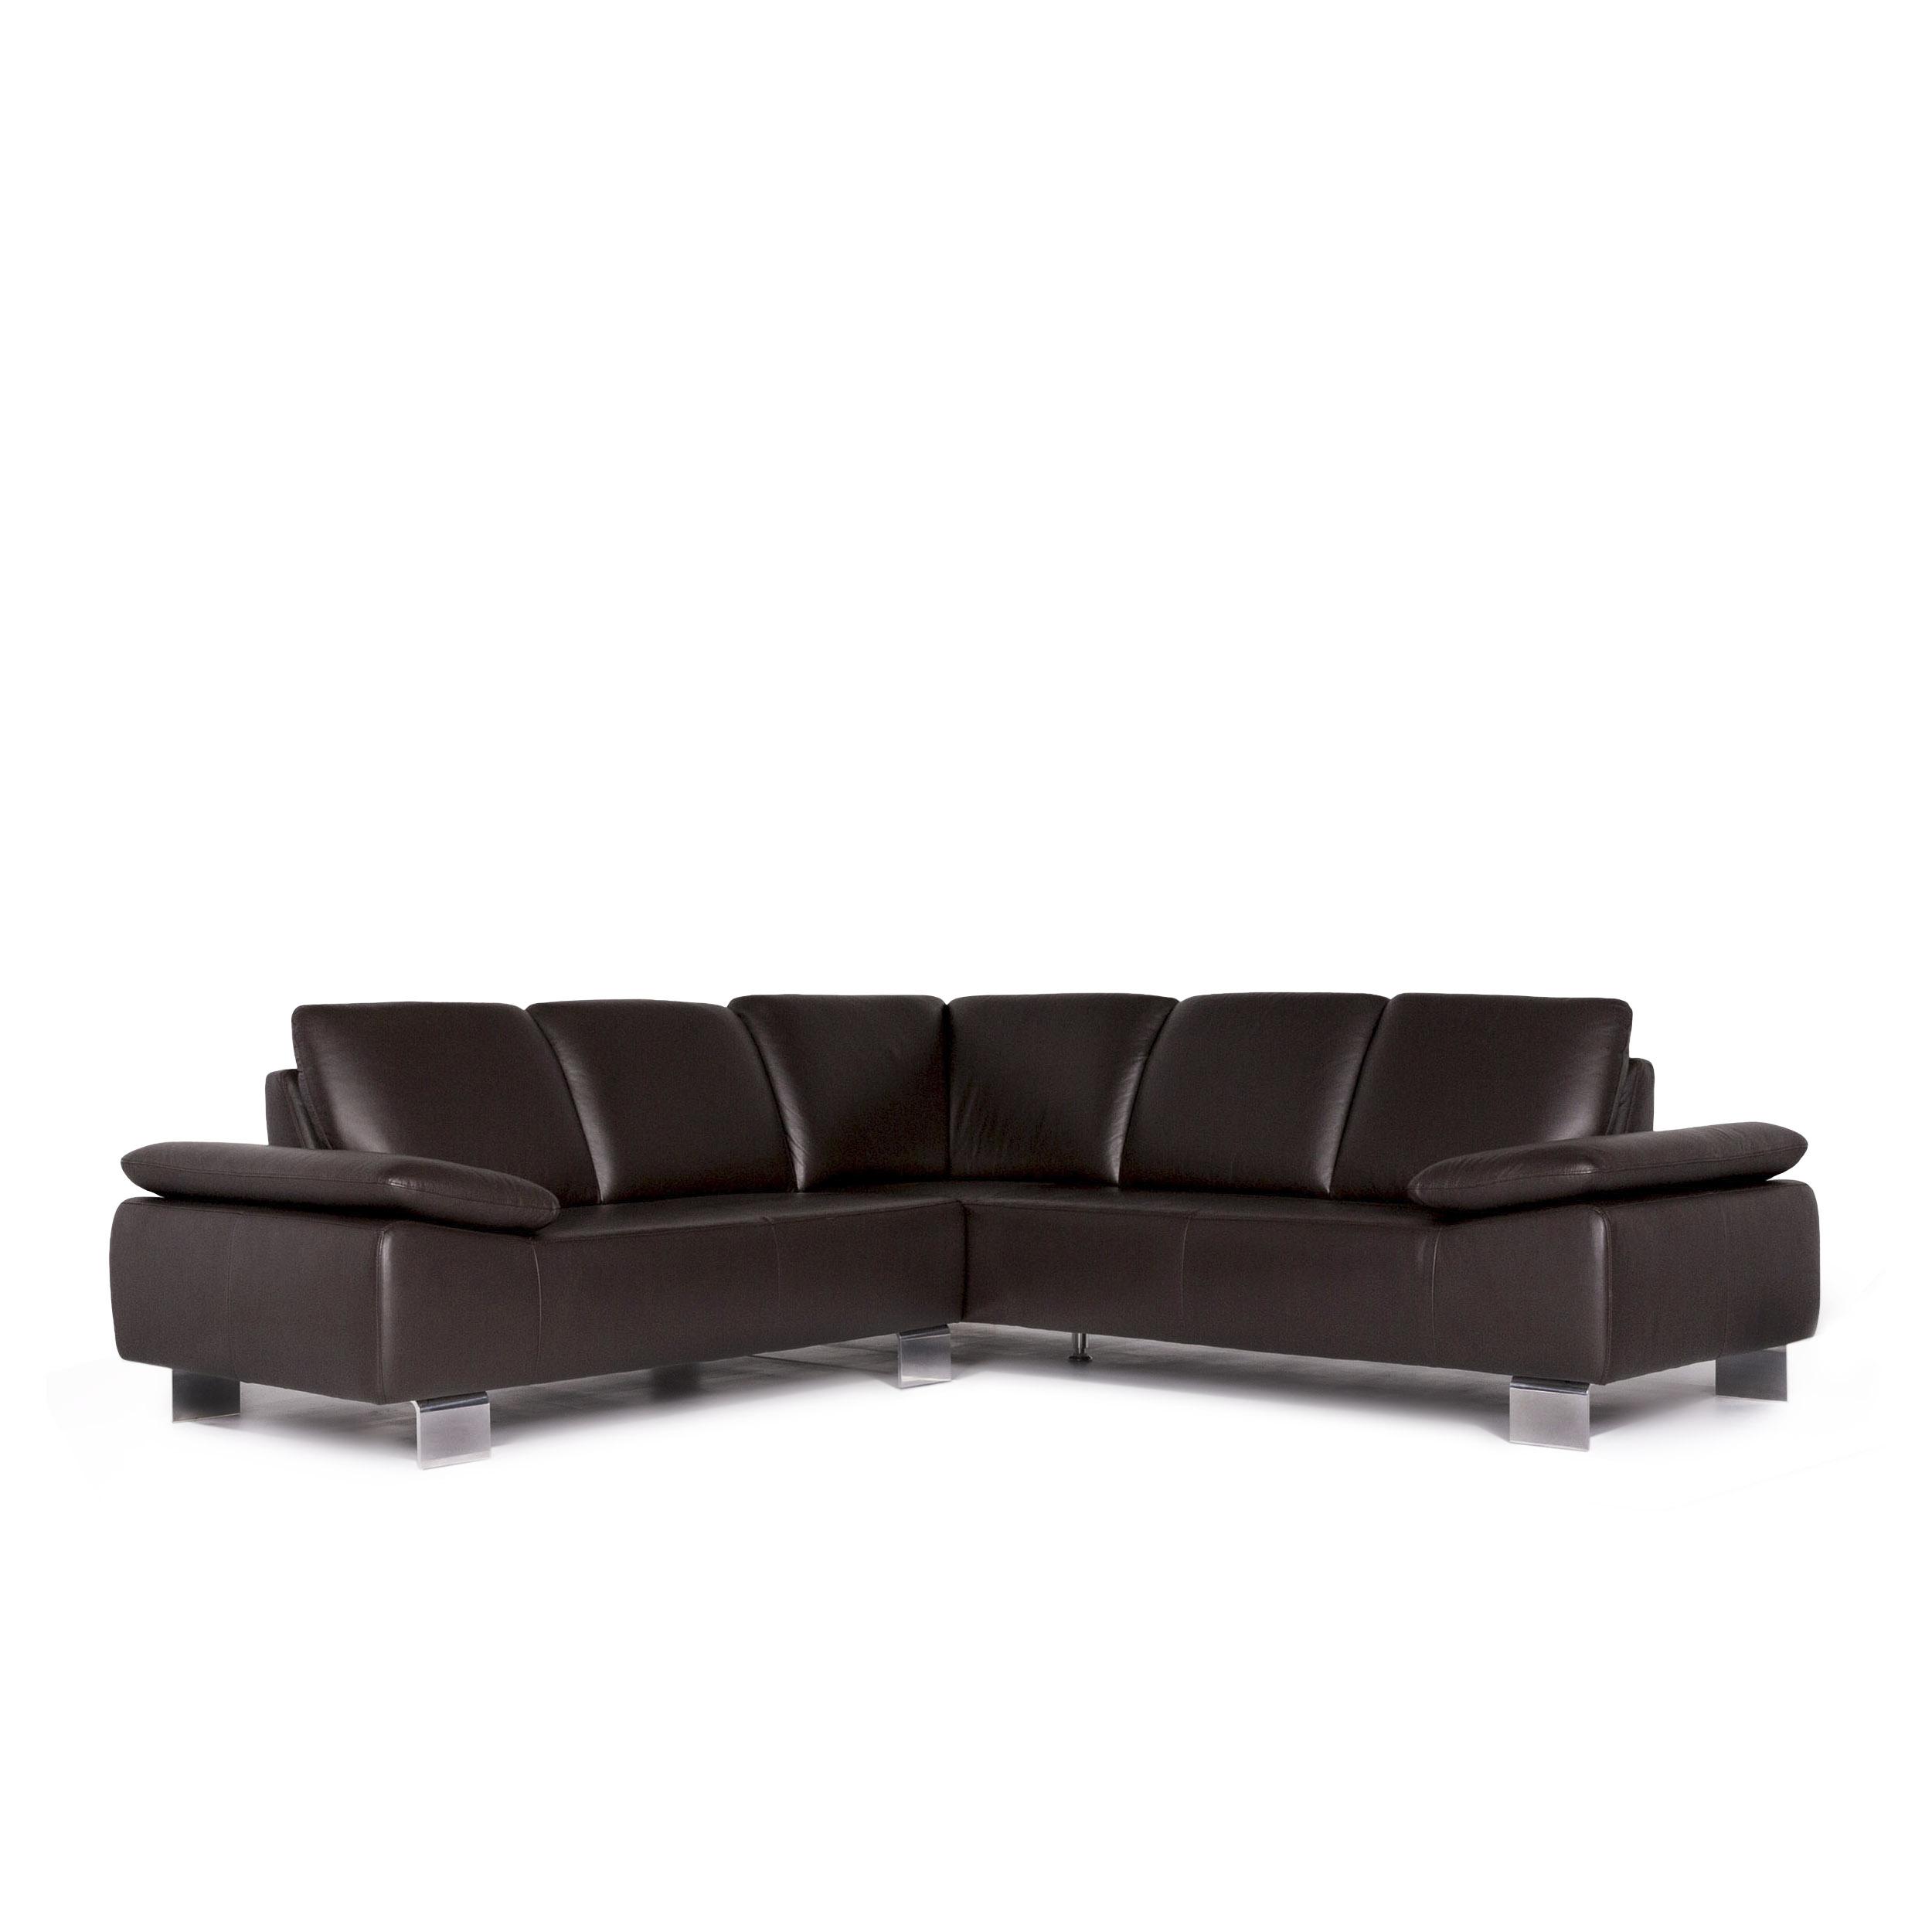 Full Size of Schillig Sofa Alexx Plus Online Kaufen W Ewald Leder Ecksofa Braun Couch 10626 Revive Interior 2 Sitzer 3 Wildleder Echtleder Karup Xxl U Form Boxspring Sofa Schillig Sofa